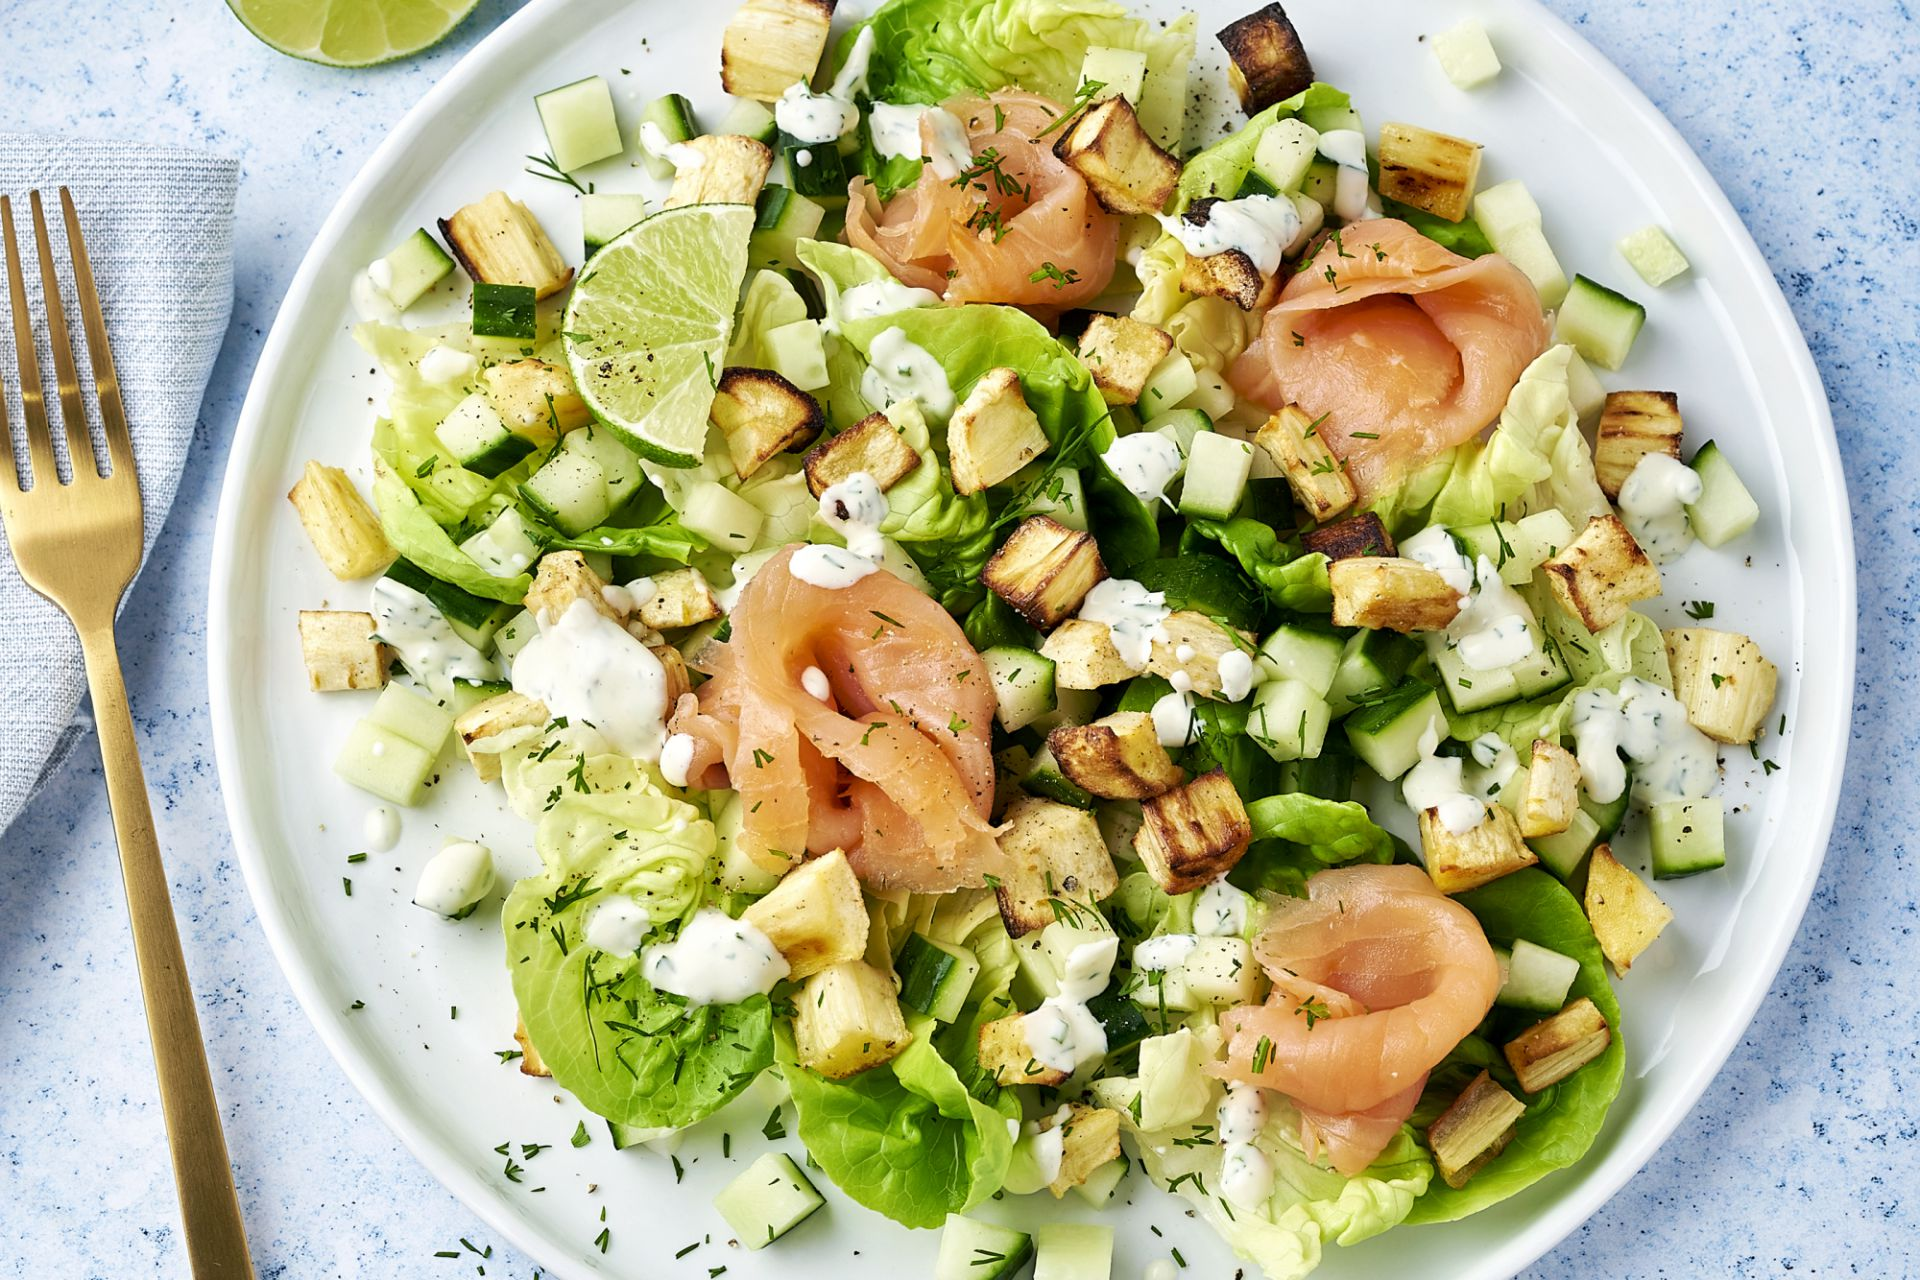 Frisse salade met gerookte zalm en geroosterde pastinaak